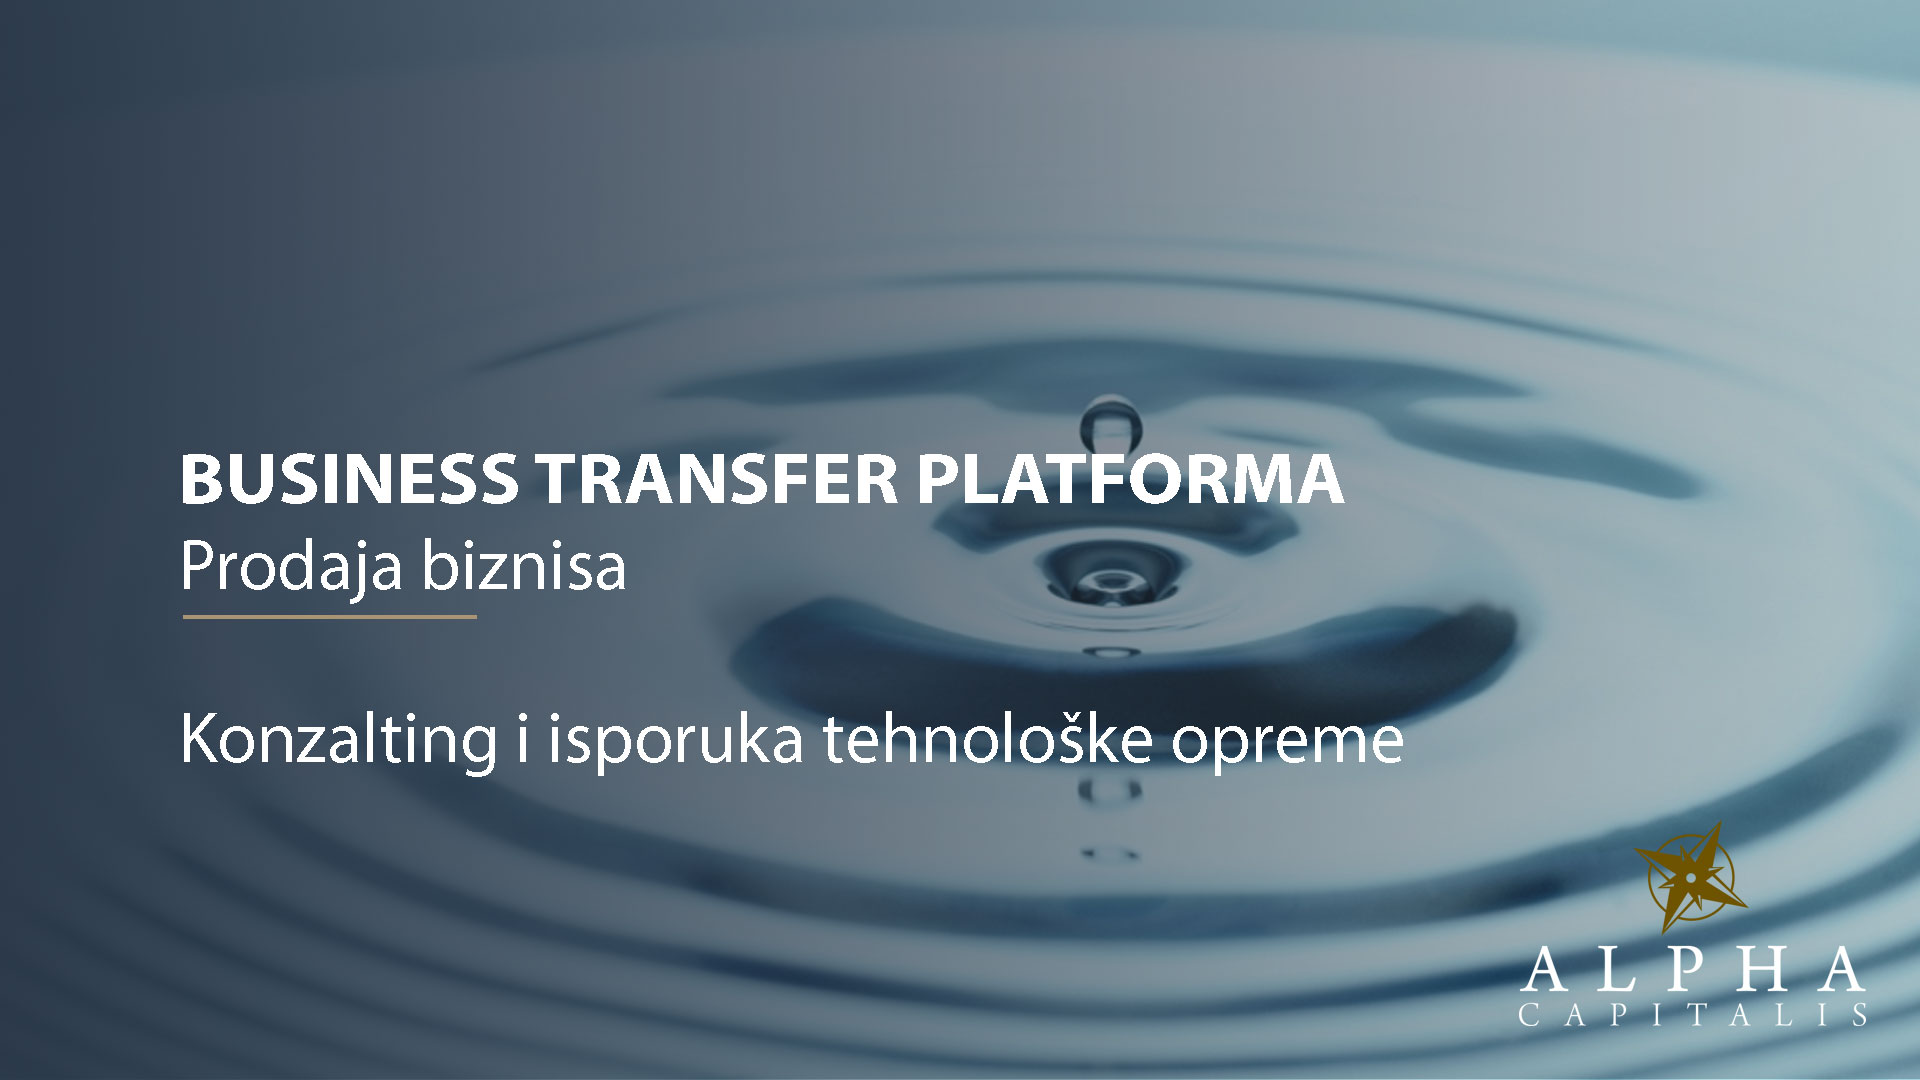 Business-transfer-platforma-konzalting-isporuka-tehnološke-opreme